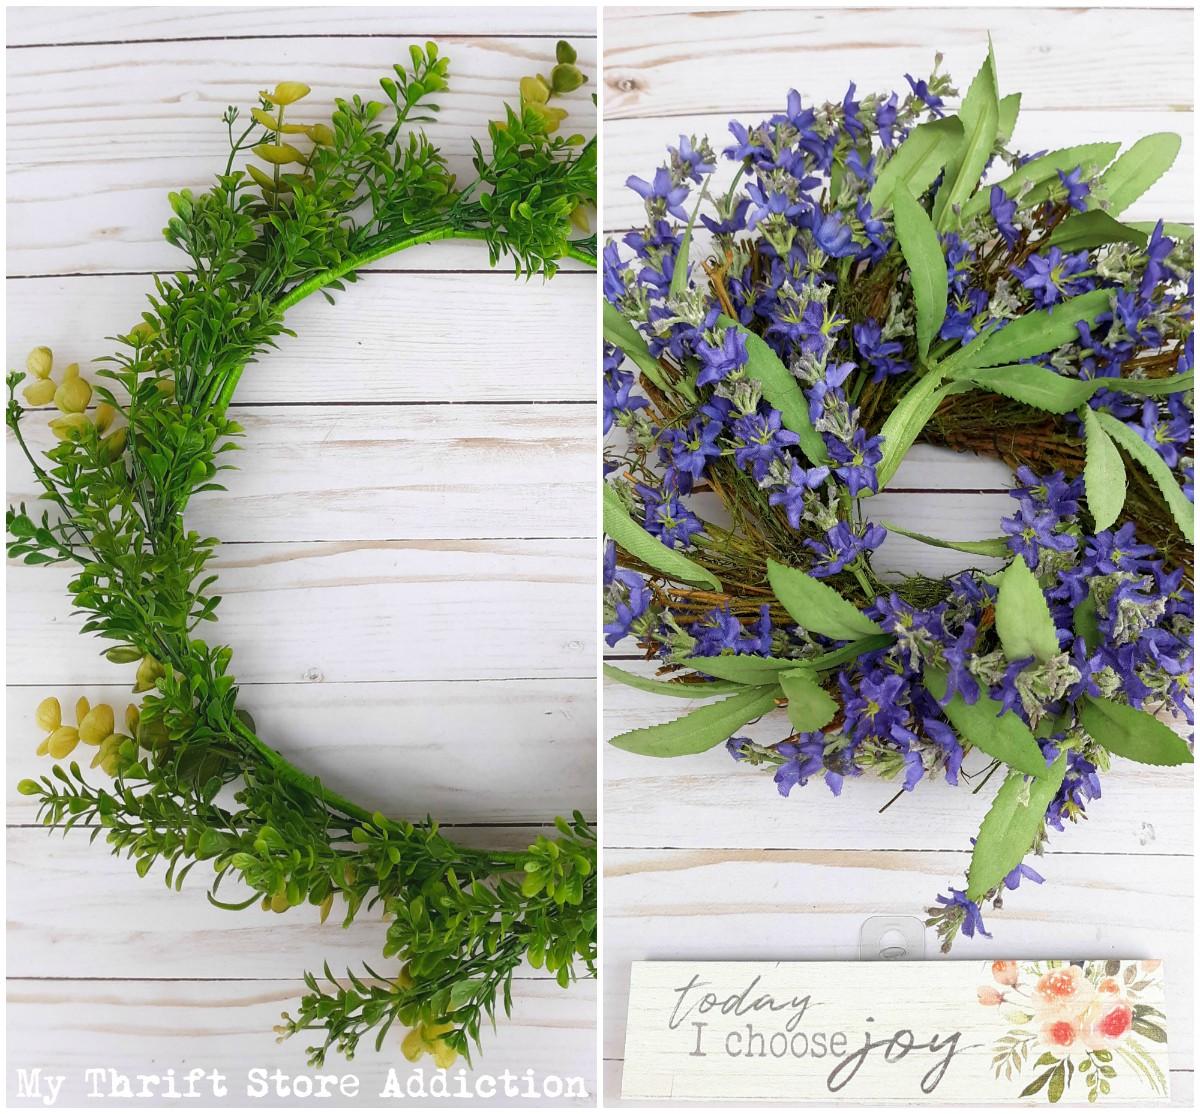 DIY layered wreath